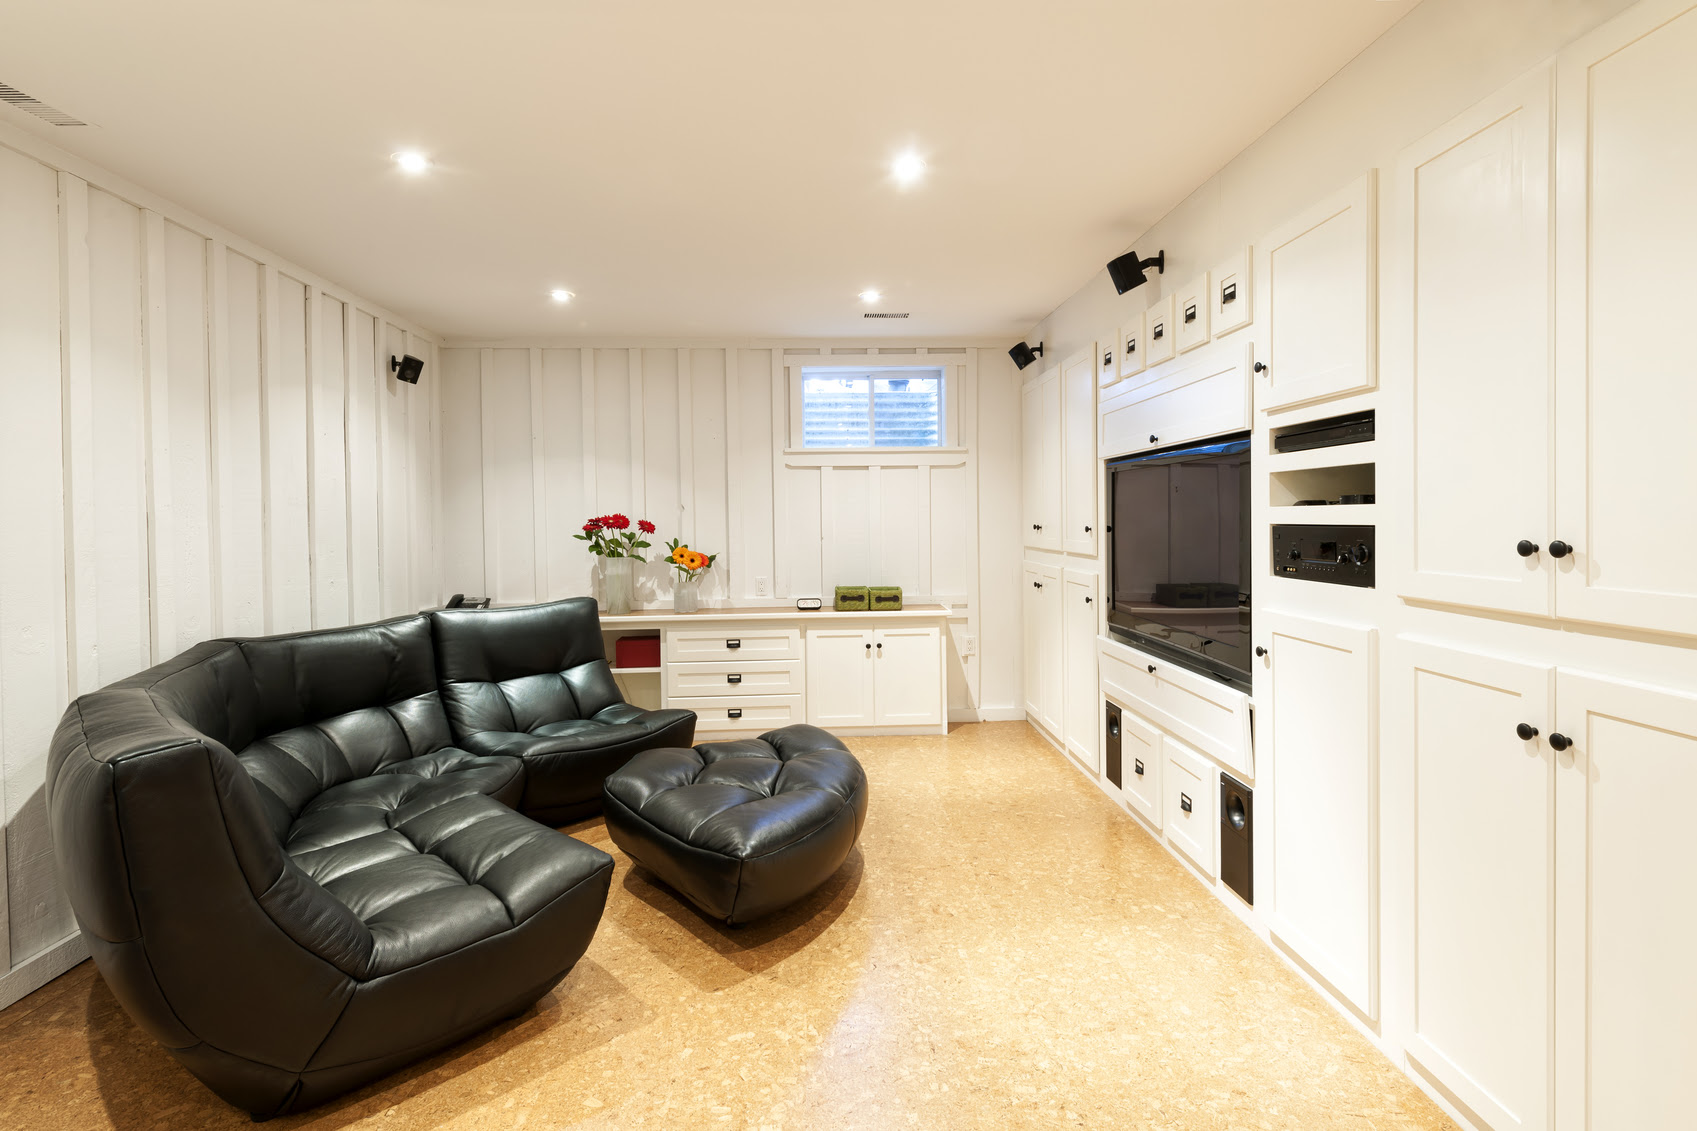 Remodel Ideas For A Low Ceiling Basement Surdus Remodeling